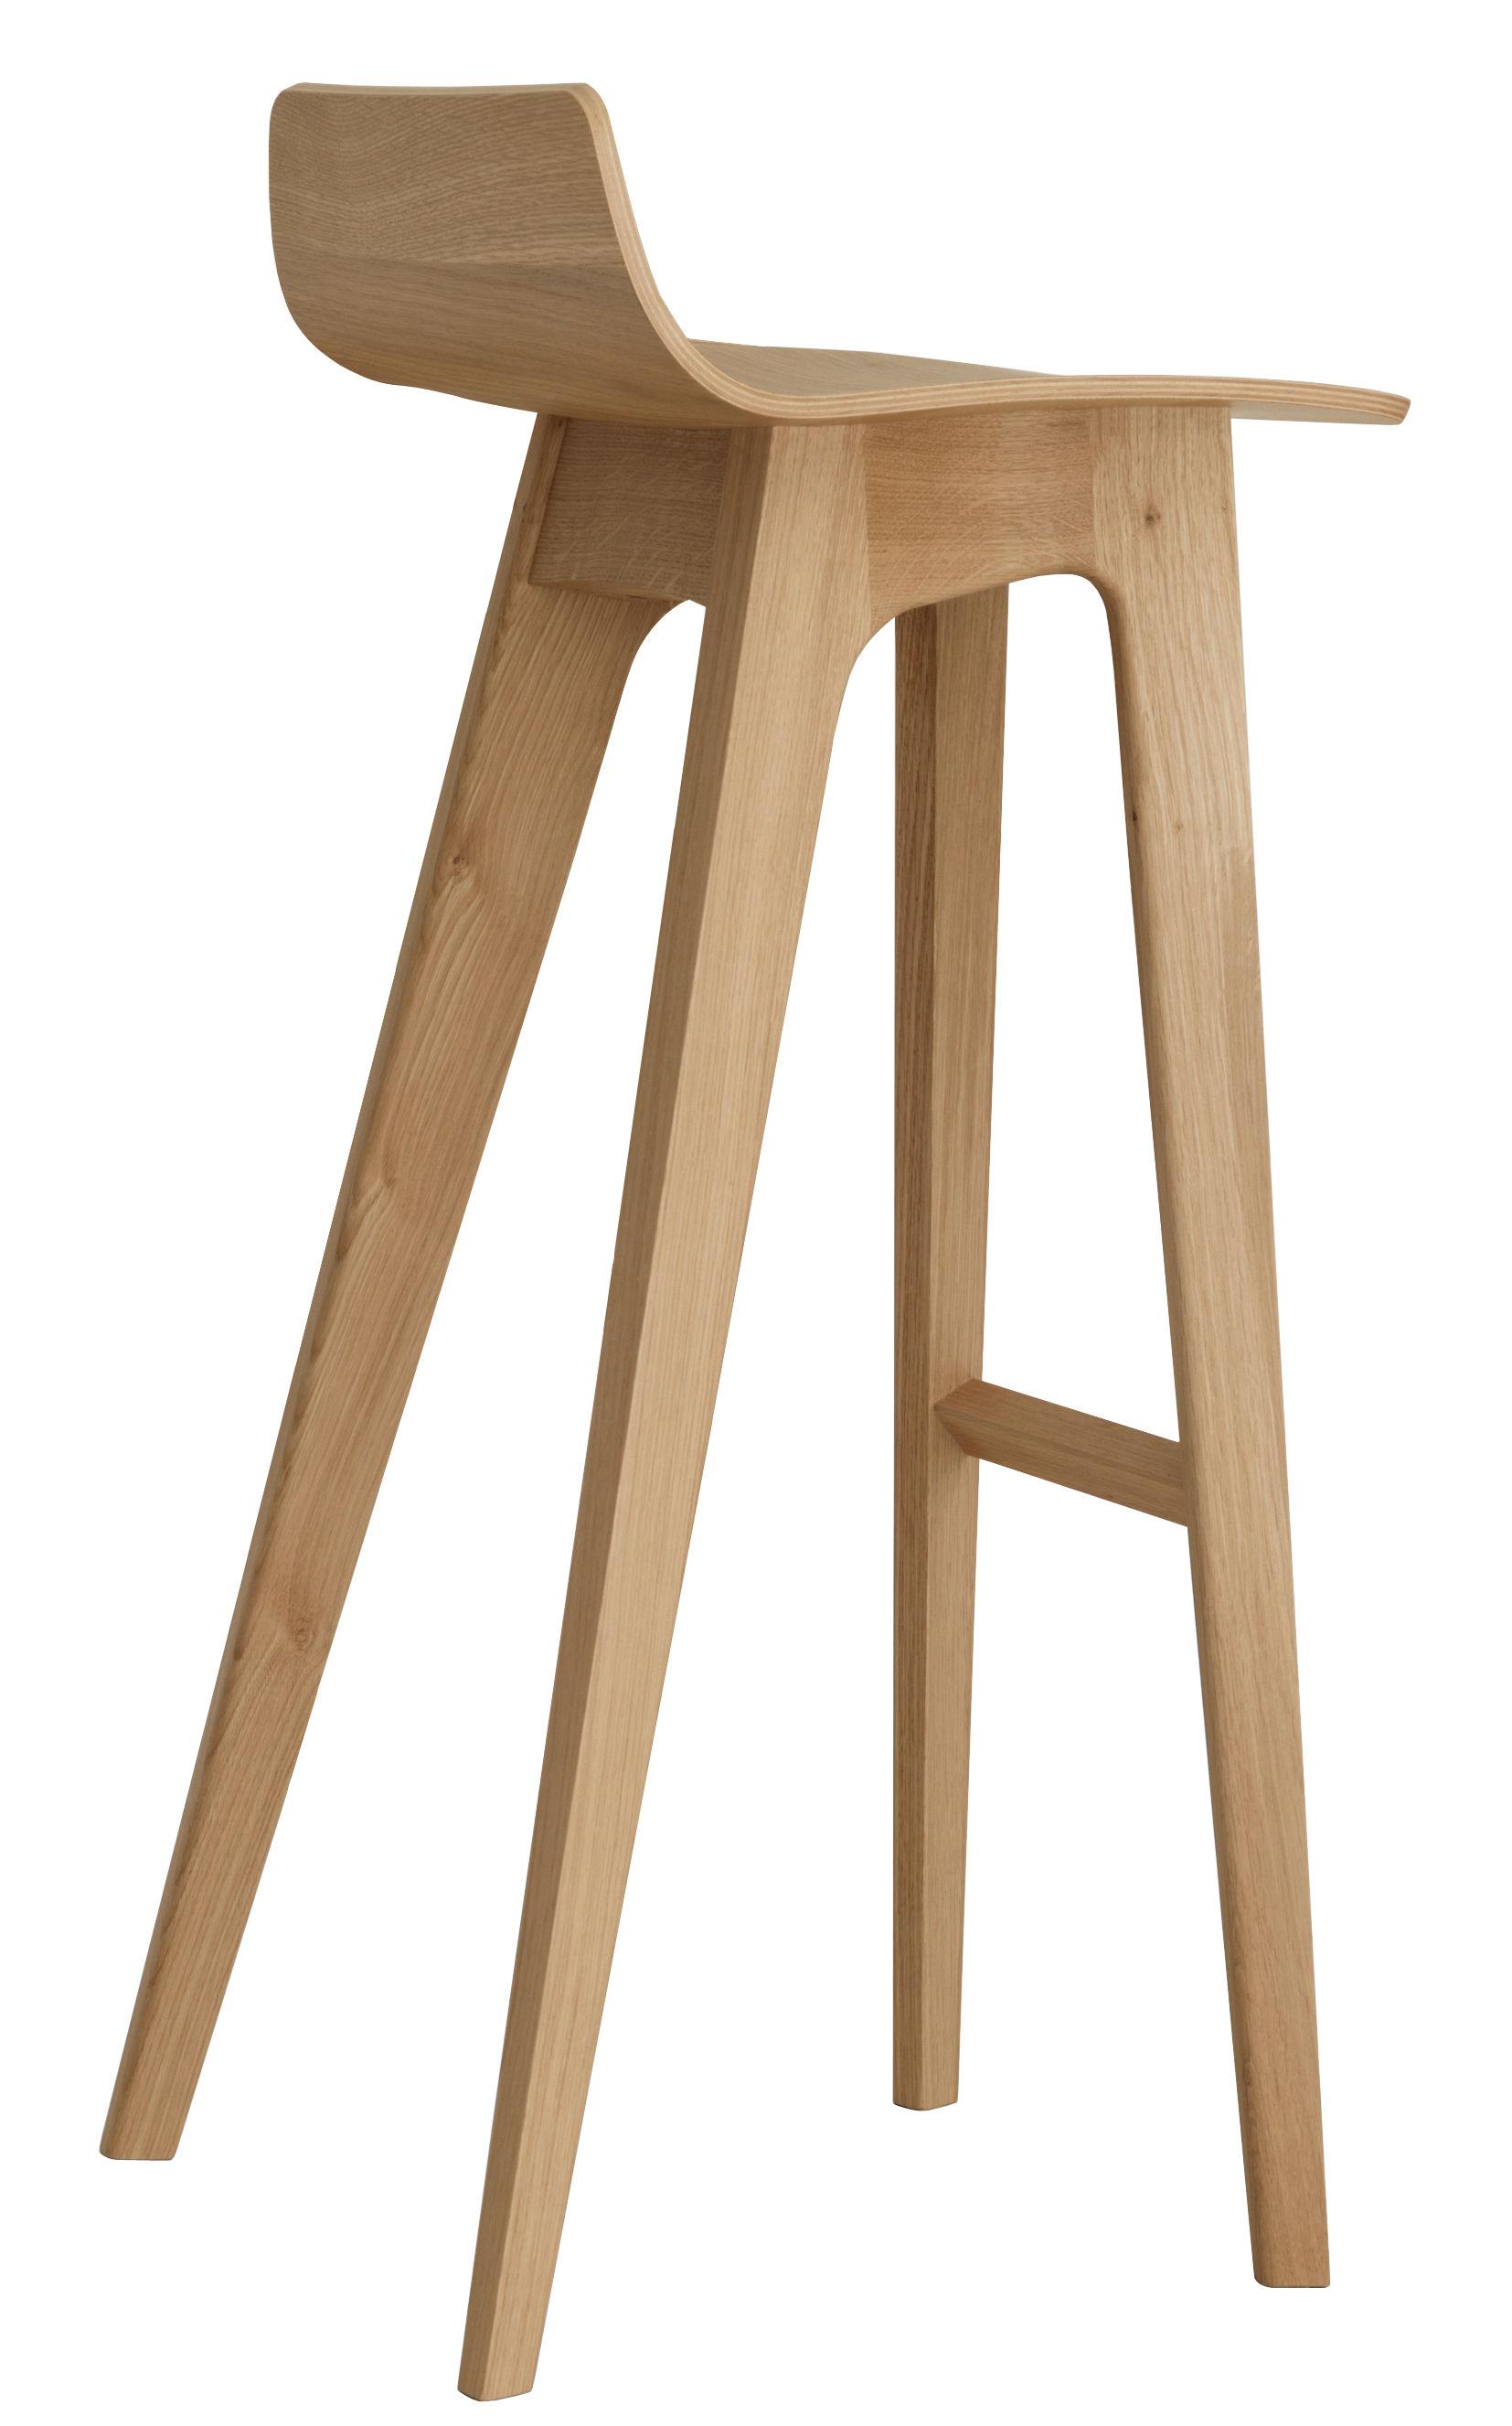 Furniture - Bar Stools - Morph Bar stool - Wood - H 80 cm by Zeitraum - Oak - Solid oak